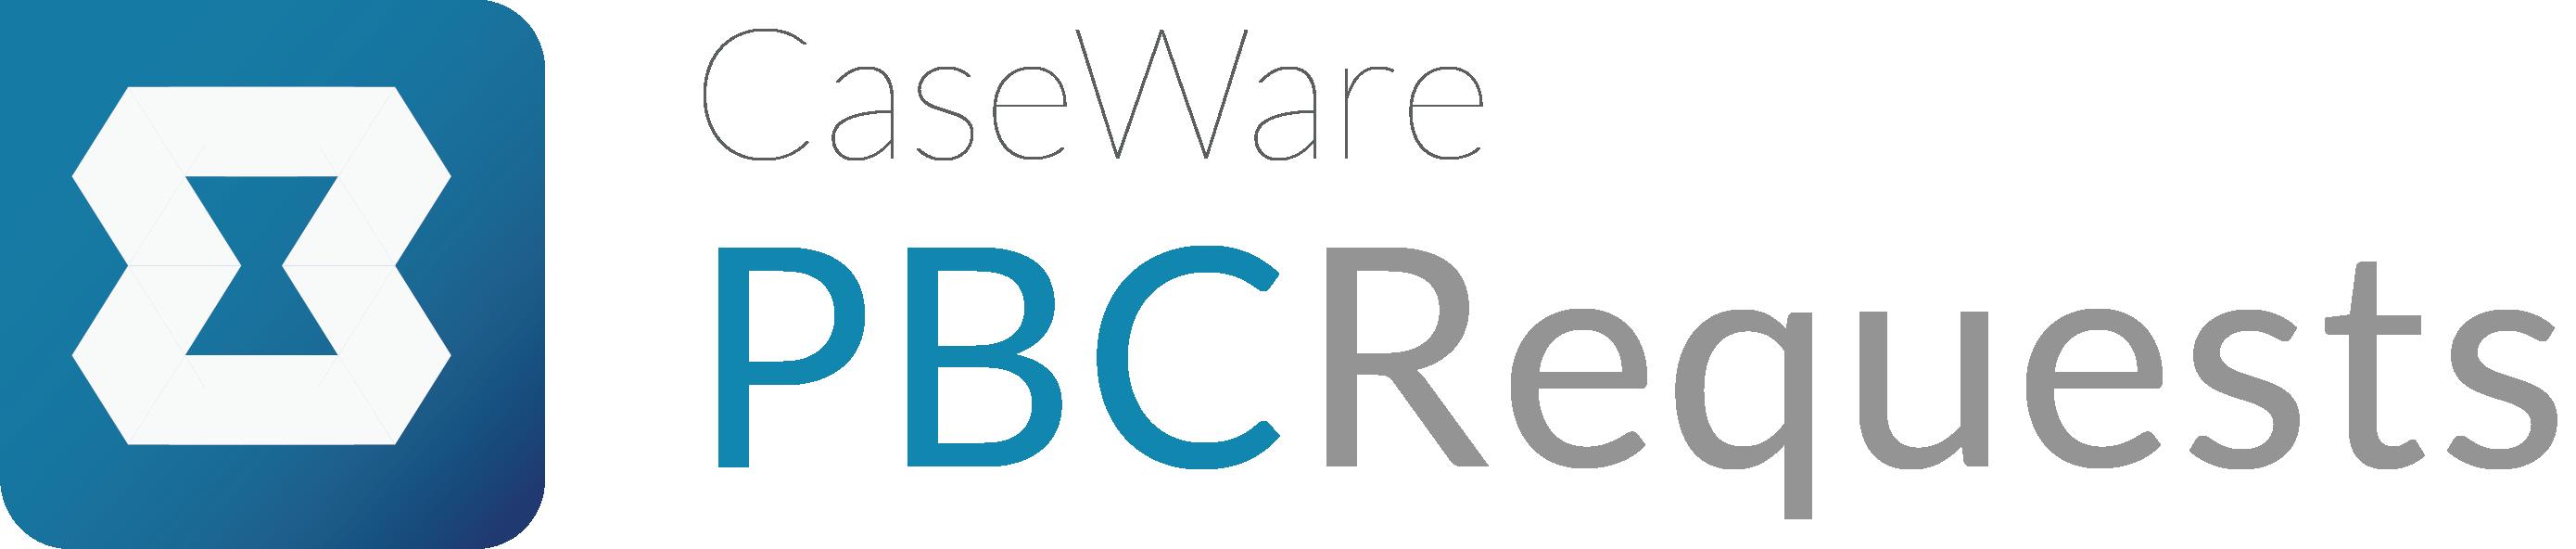 PBC Request_LogoLockup